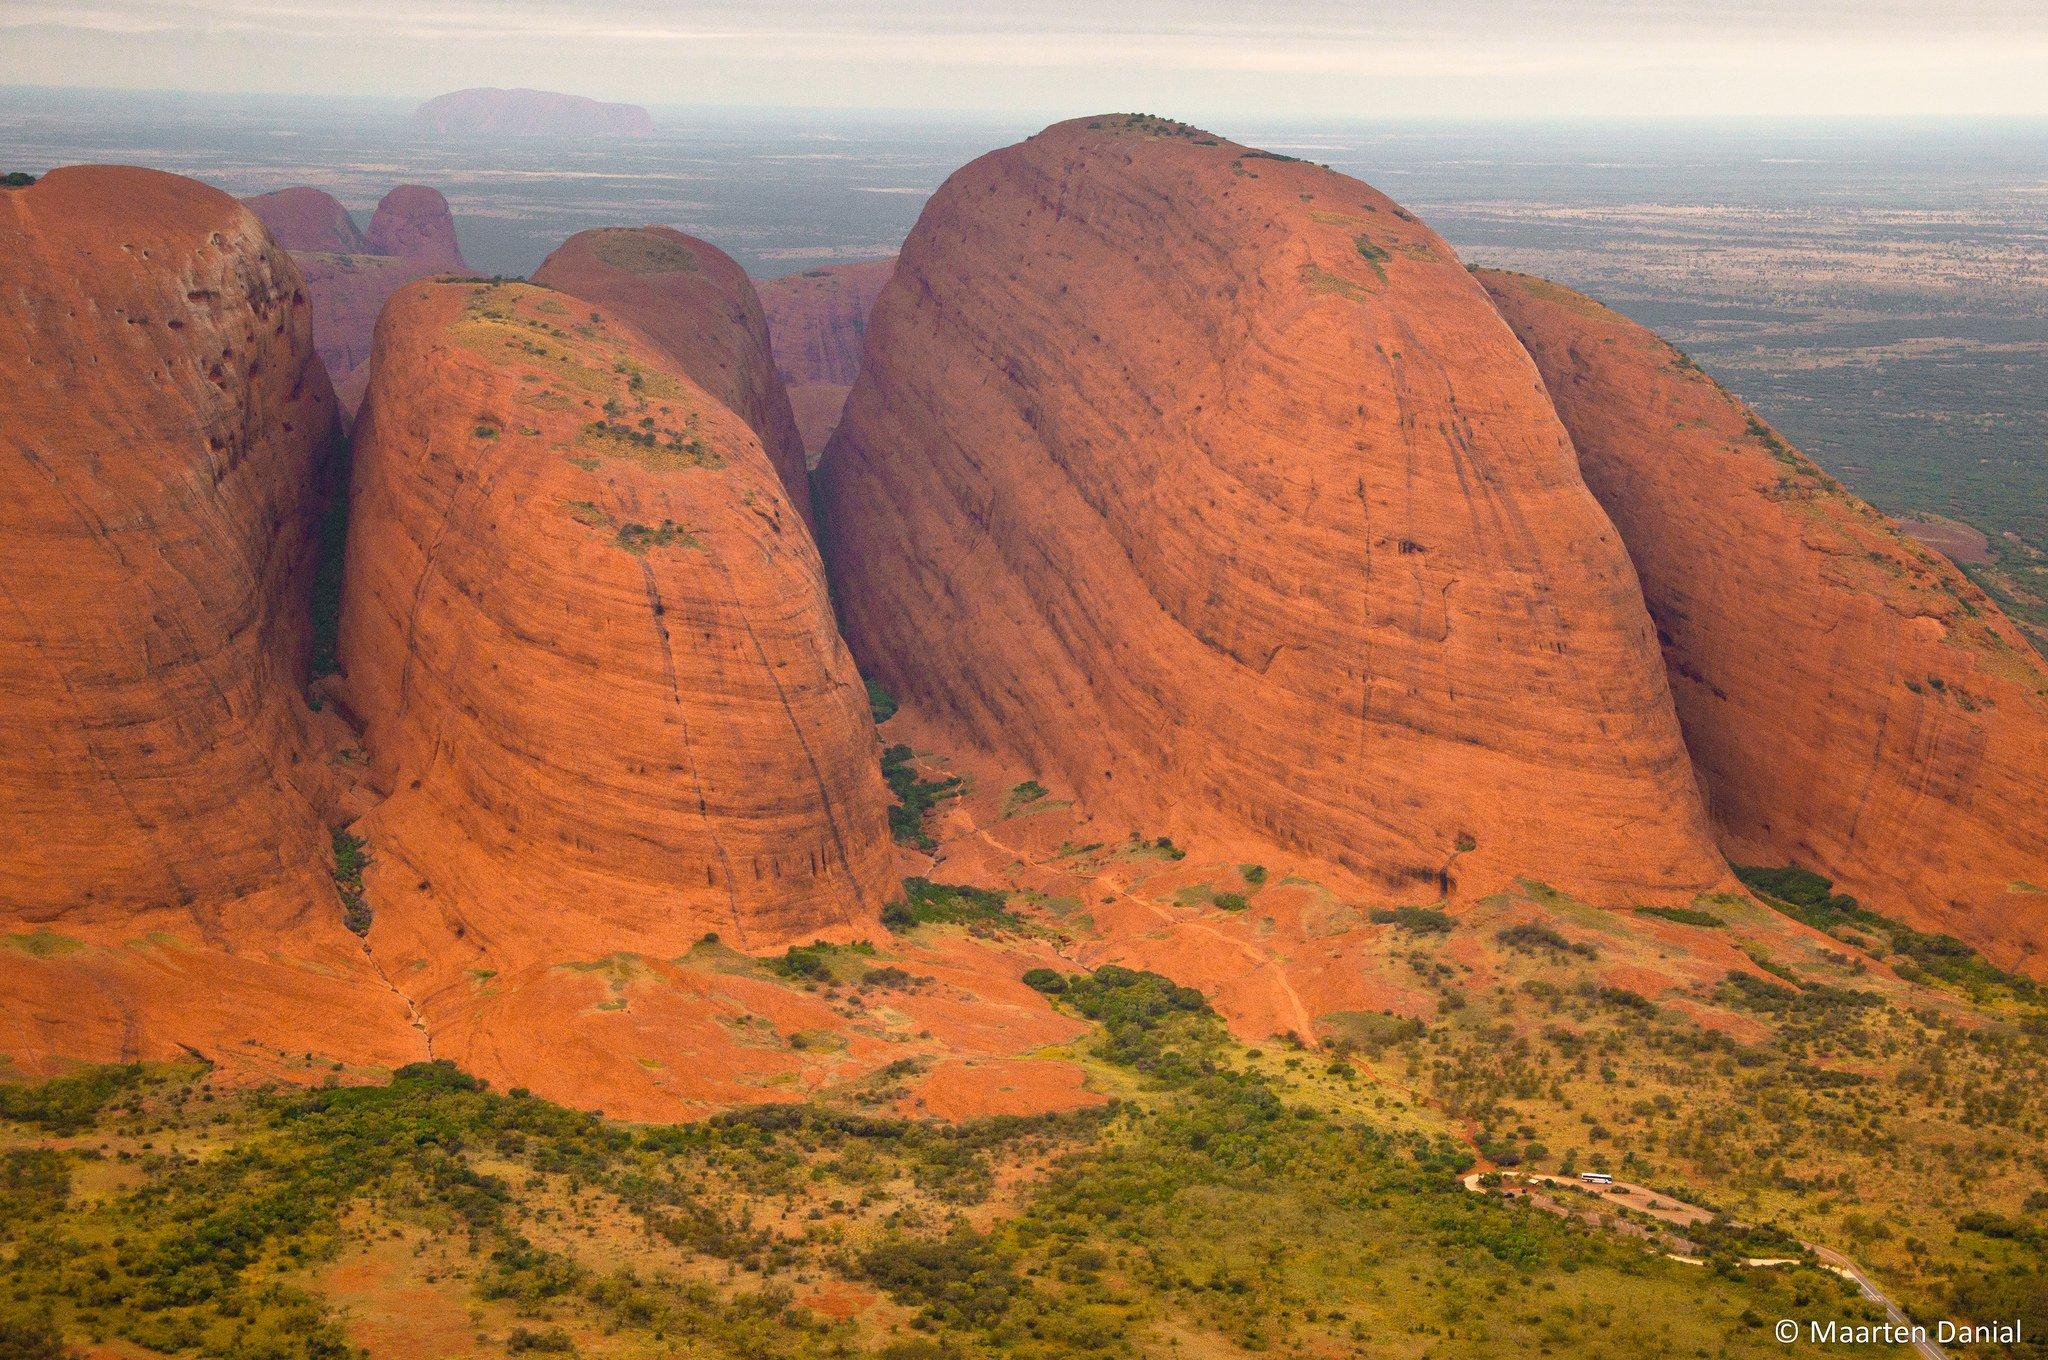 Kata Tjuta (the Olgas), NT, Australia by Maarten Danial (CC)